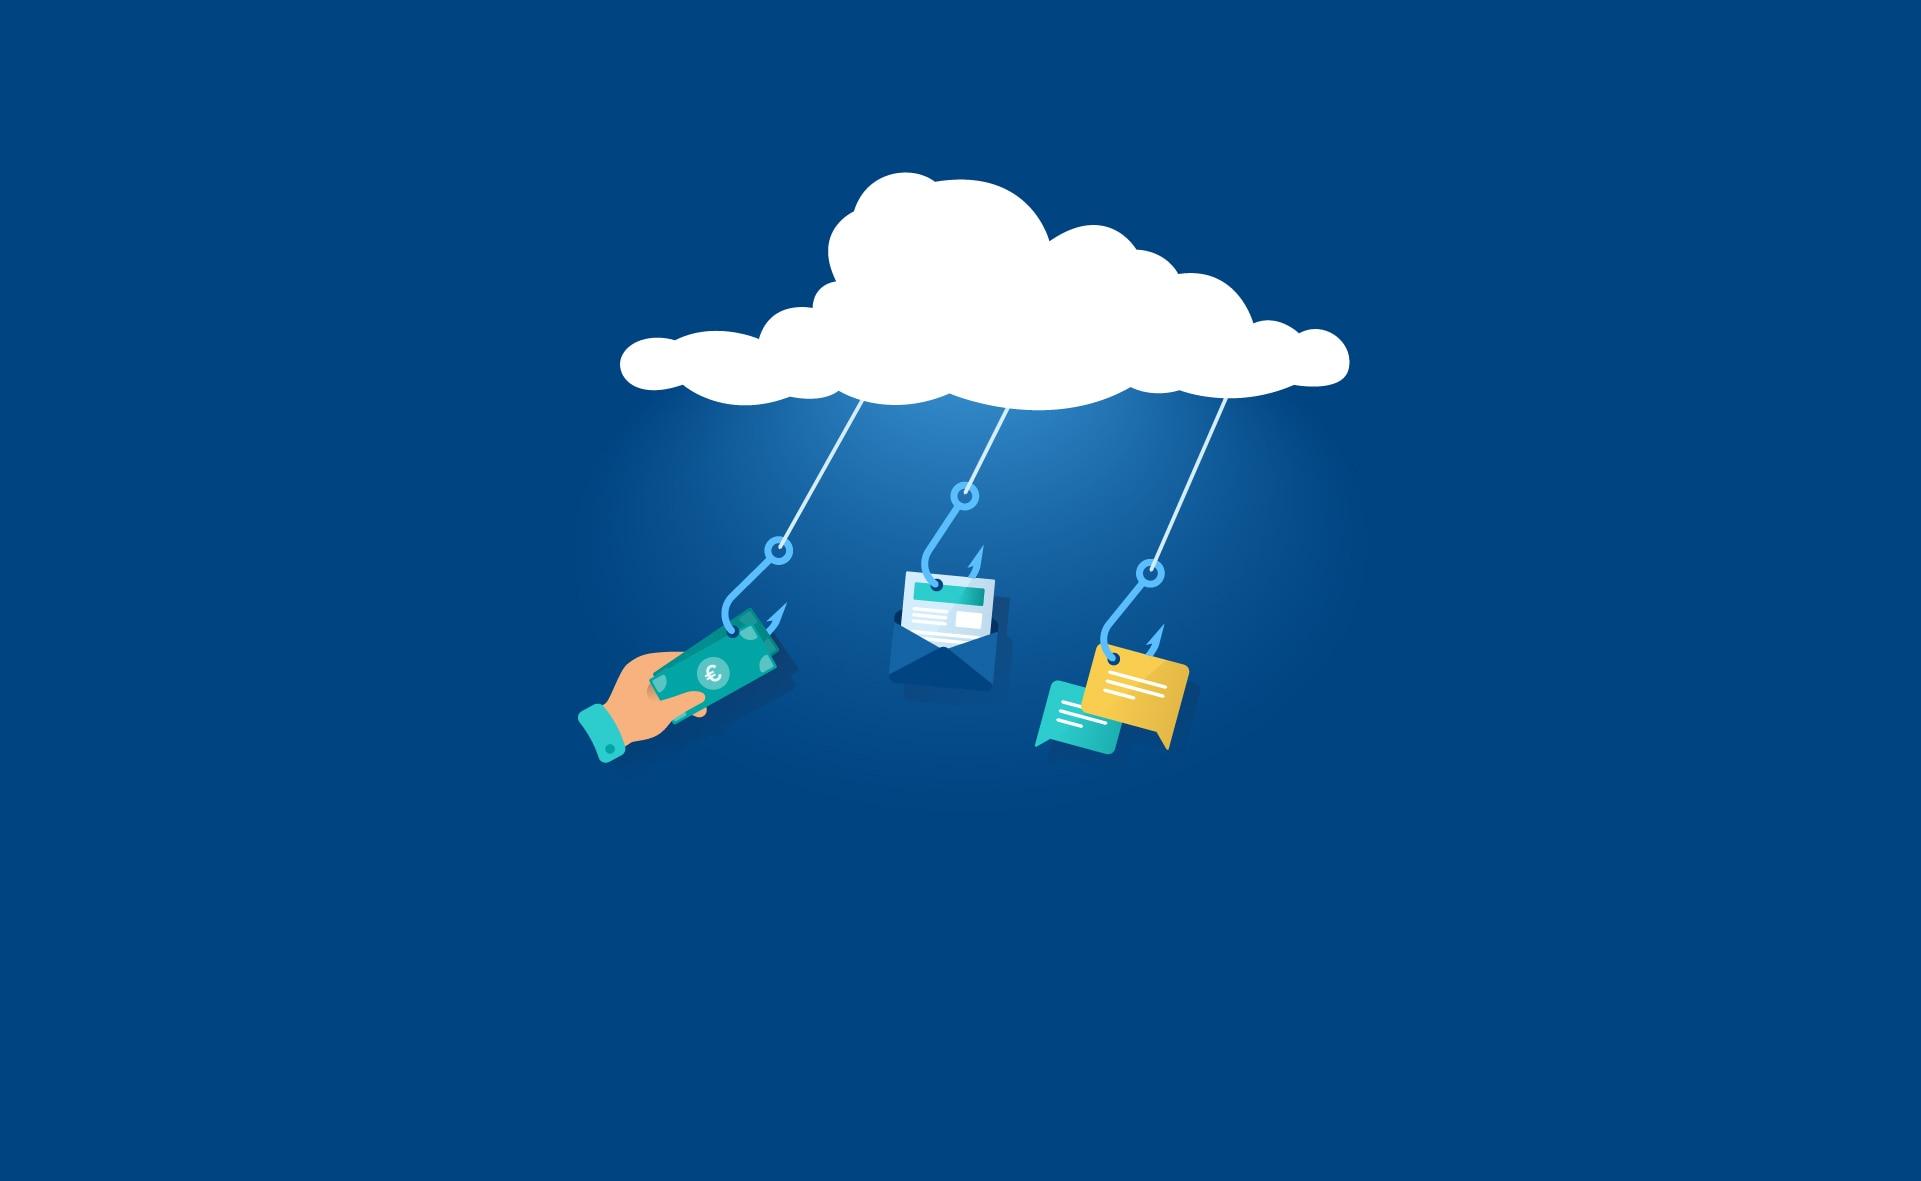 BBVA_Phishing-al-desnudo_ciberseguridad-proteccion-online-internet